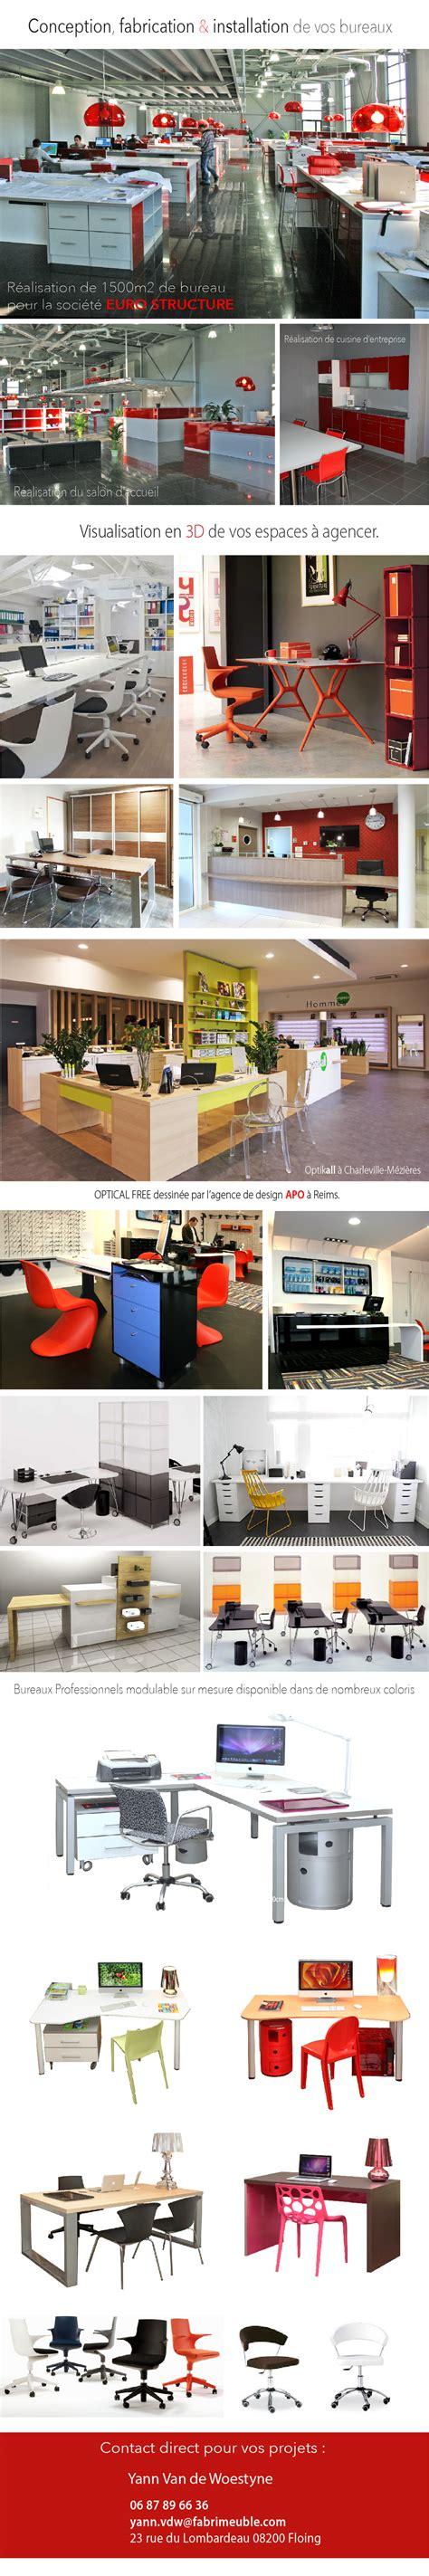 magasin professionnel cuisine cuisine salle de bain rangement living dressing fabricant